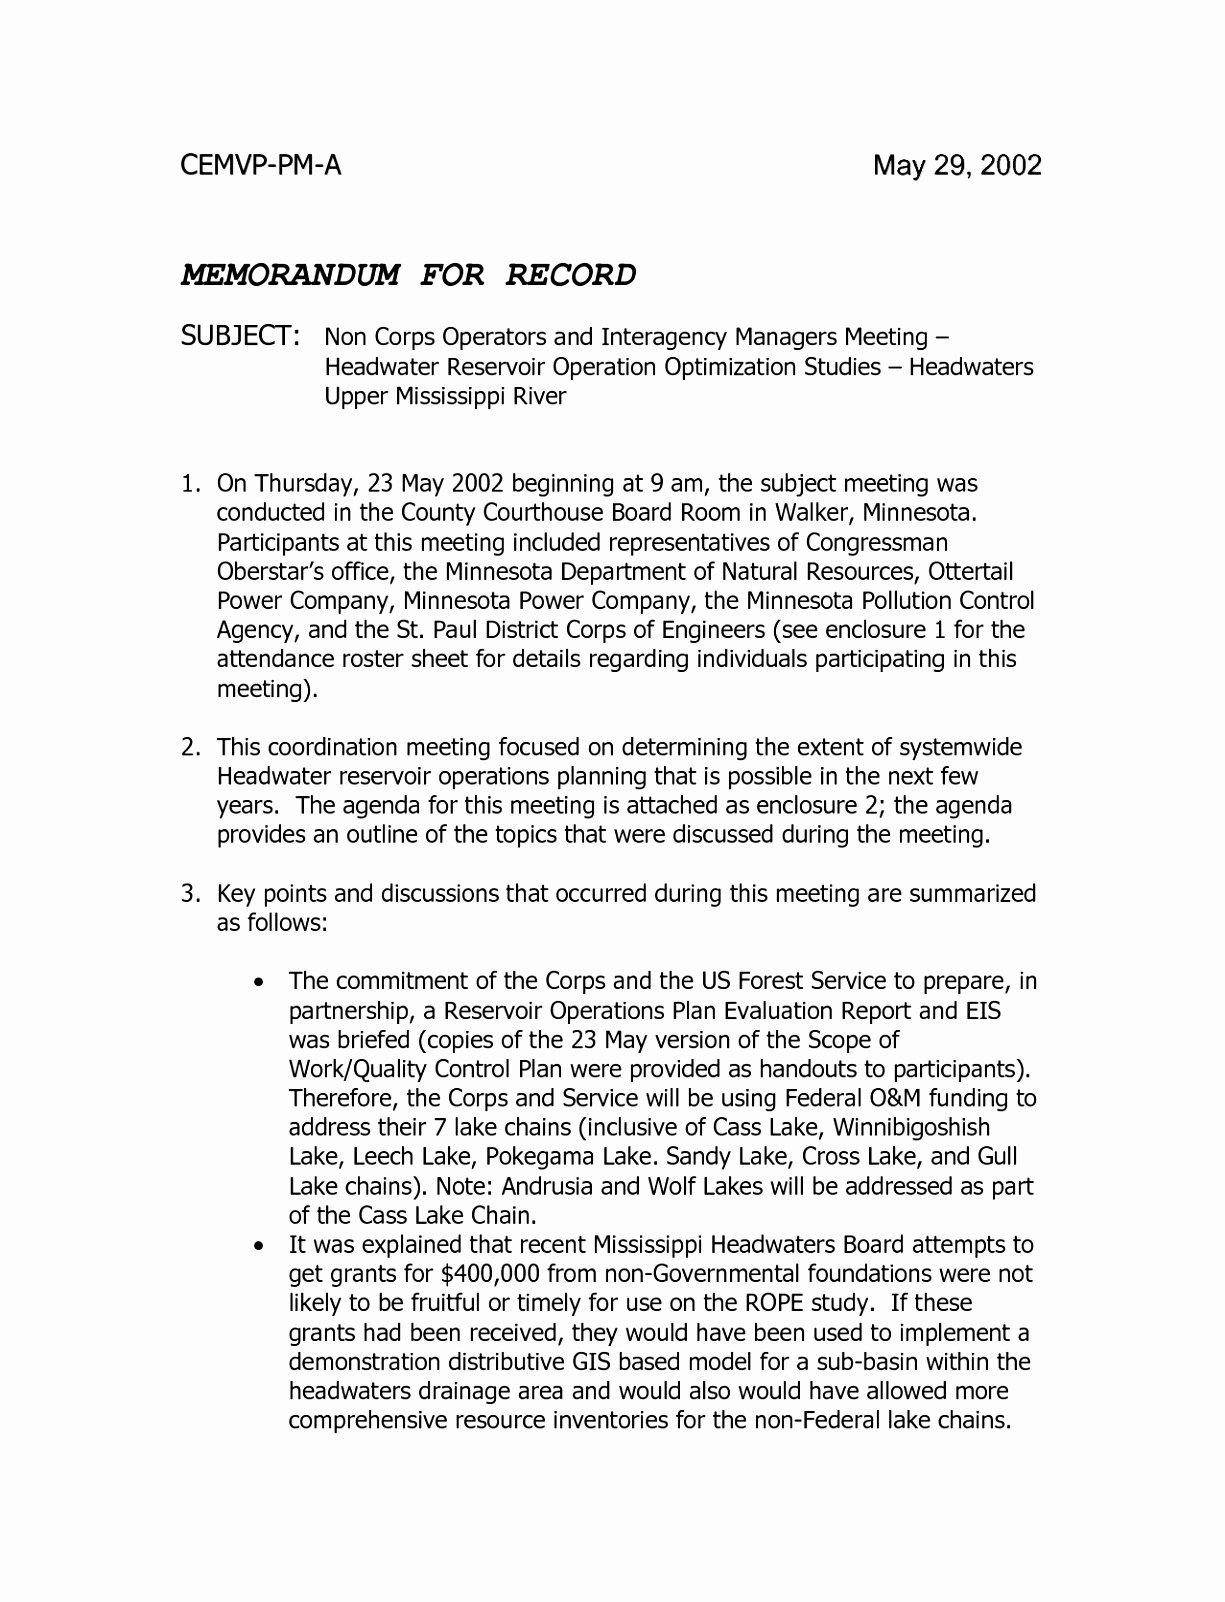 Memorandum Of Record Template New 7 Army Memorandum for Record Template Word Awruy